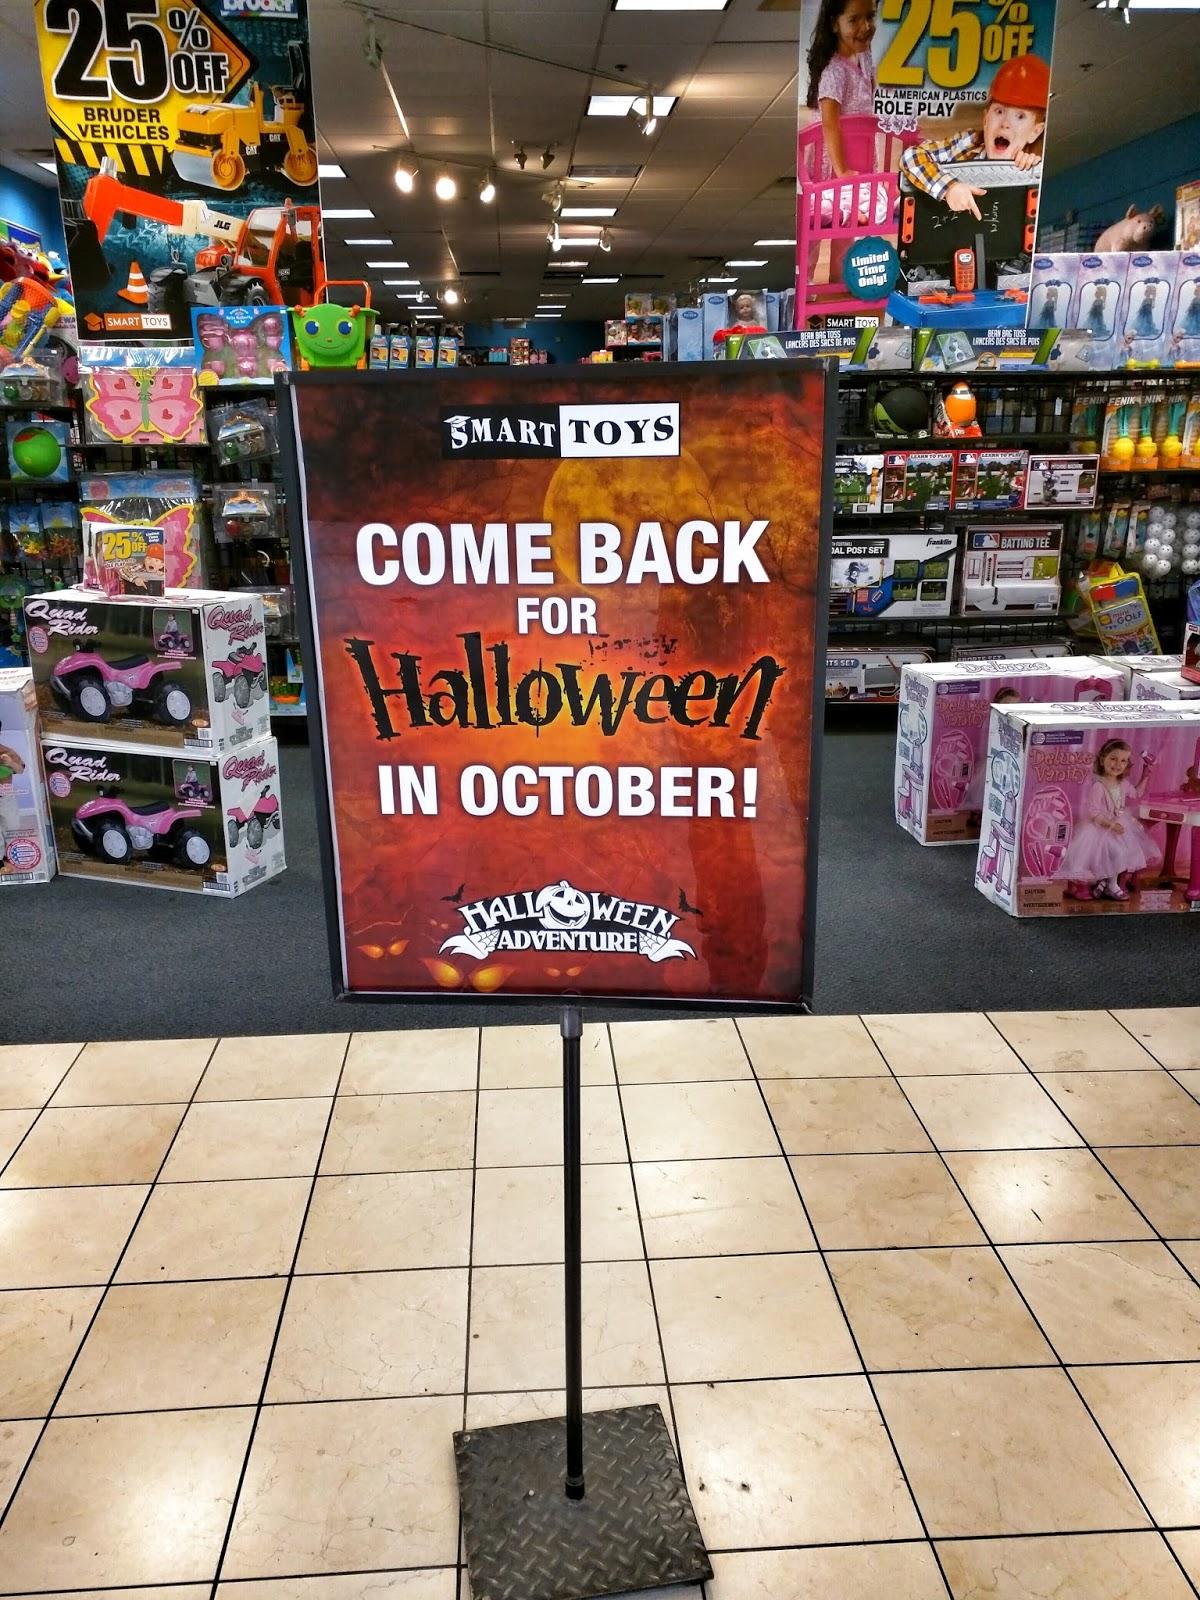 Robert Dyer @ Bethesda Row: Halloween Adventure to return to ...